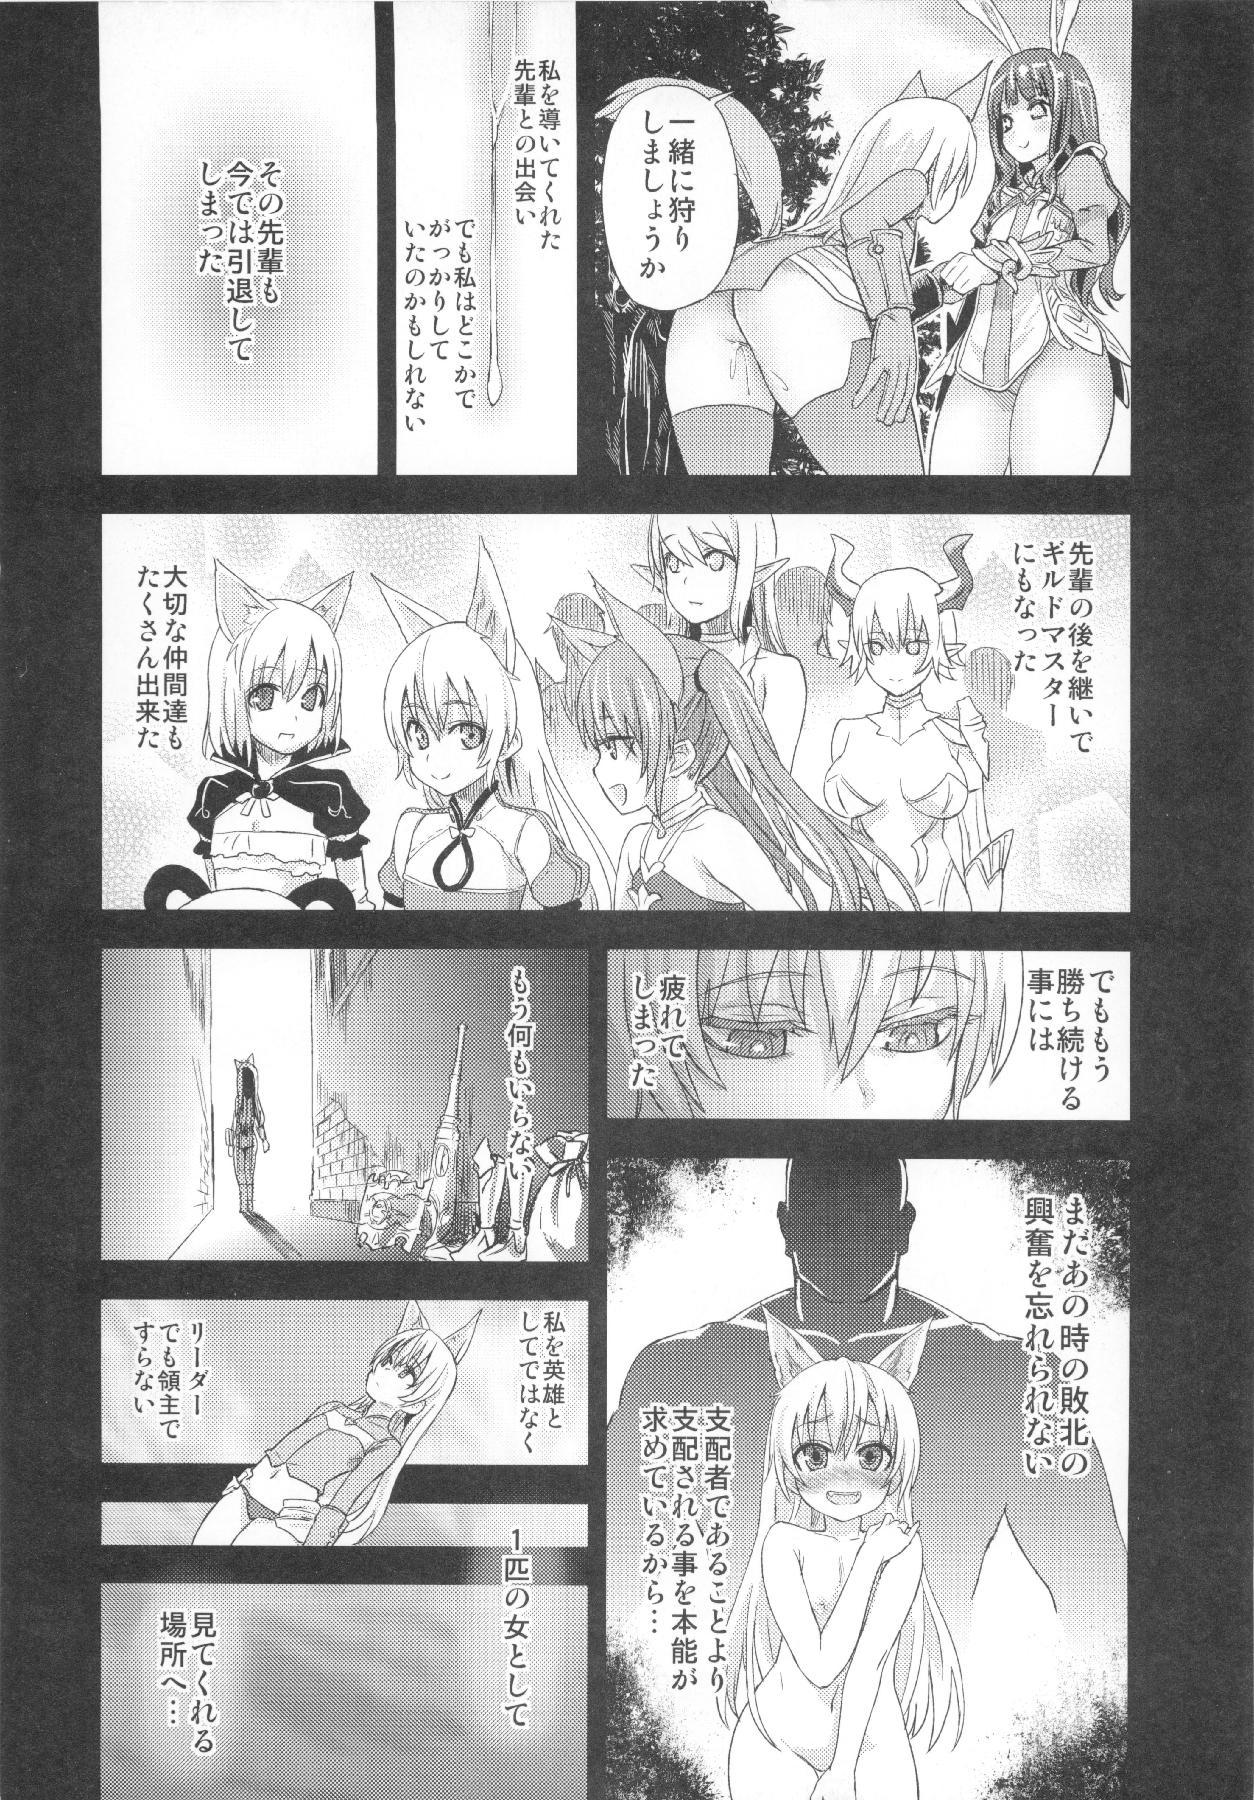 (C83) [Fatalpulse (Asanagi)] VictimGirls Compiled Vol.1 -Victimgirls Soushuuhen 1- MMO Game Selection (Various) 158